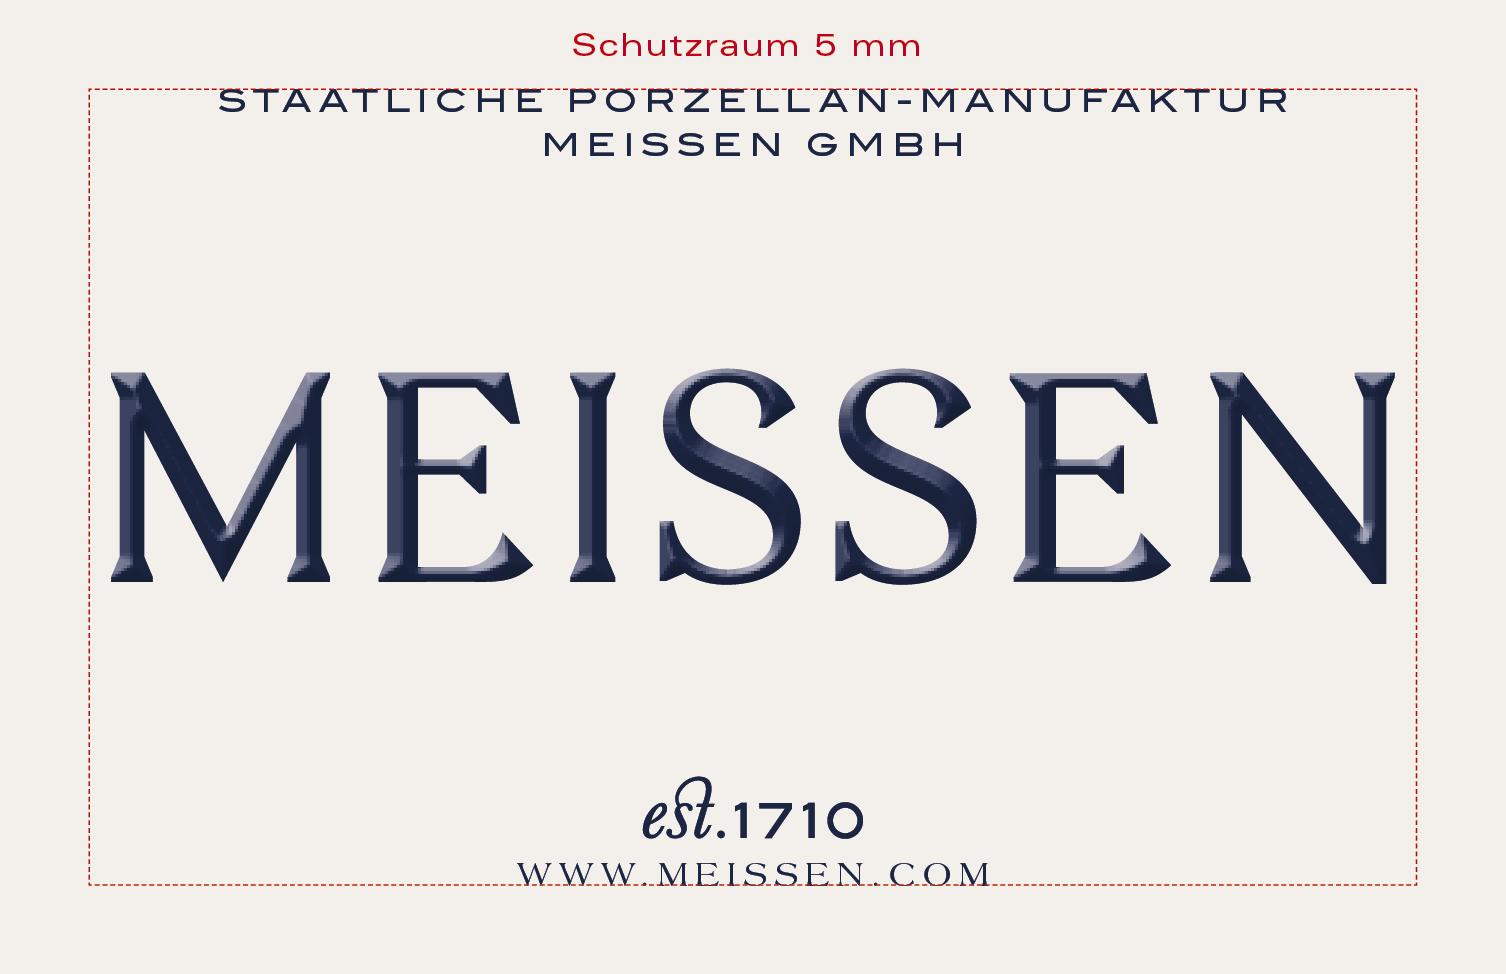 visitenkarten-schutzraum-1905293